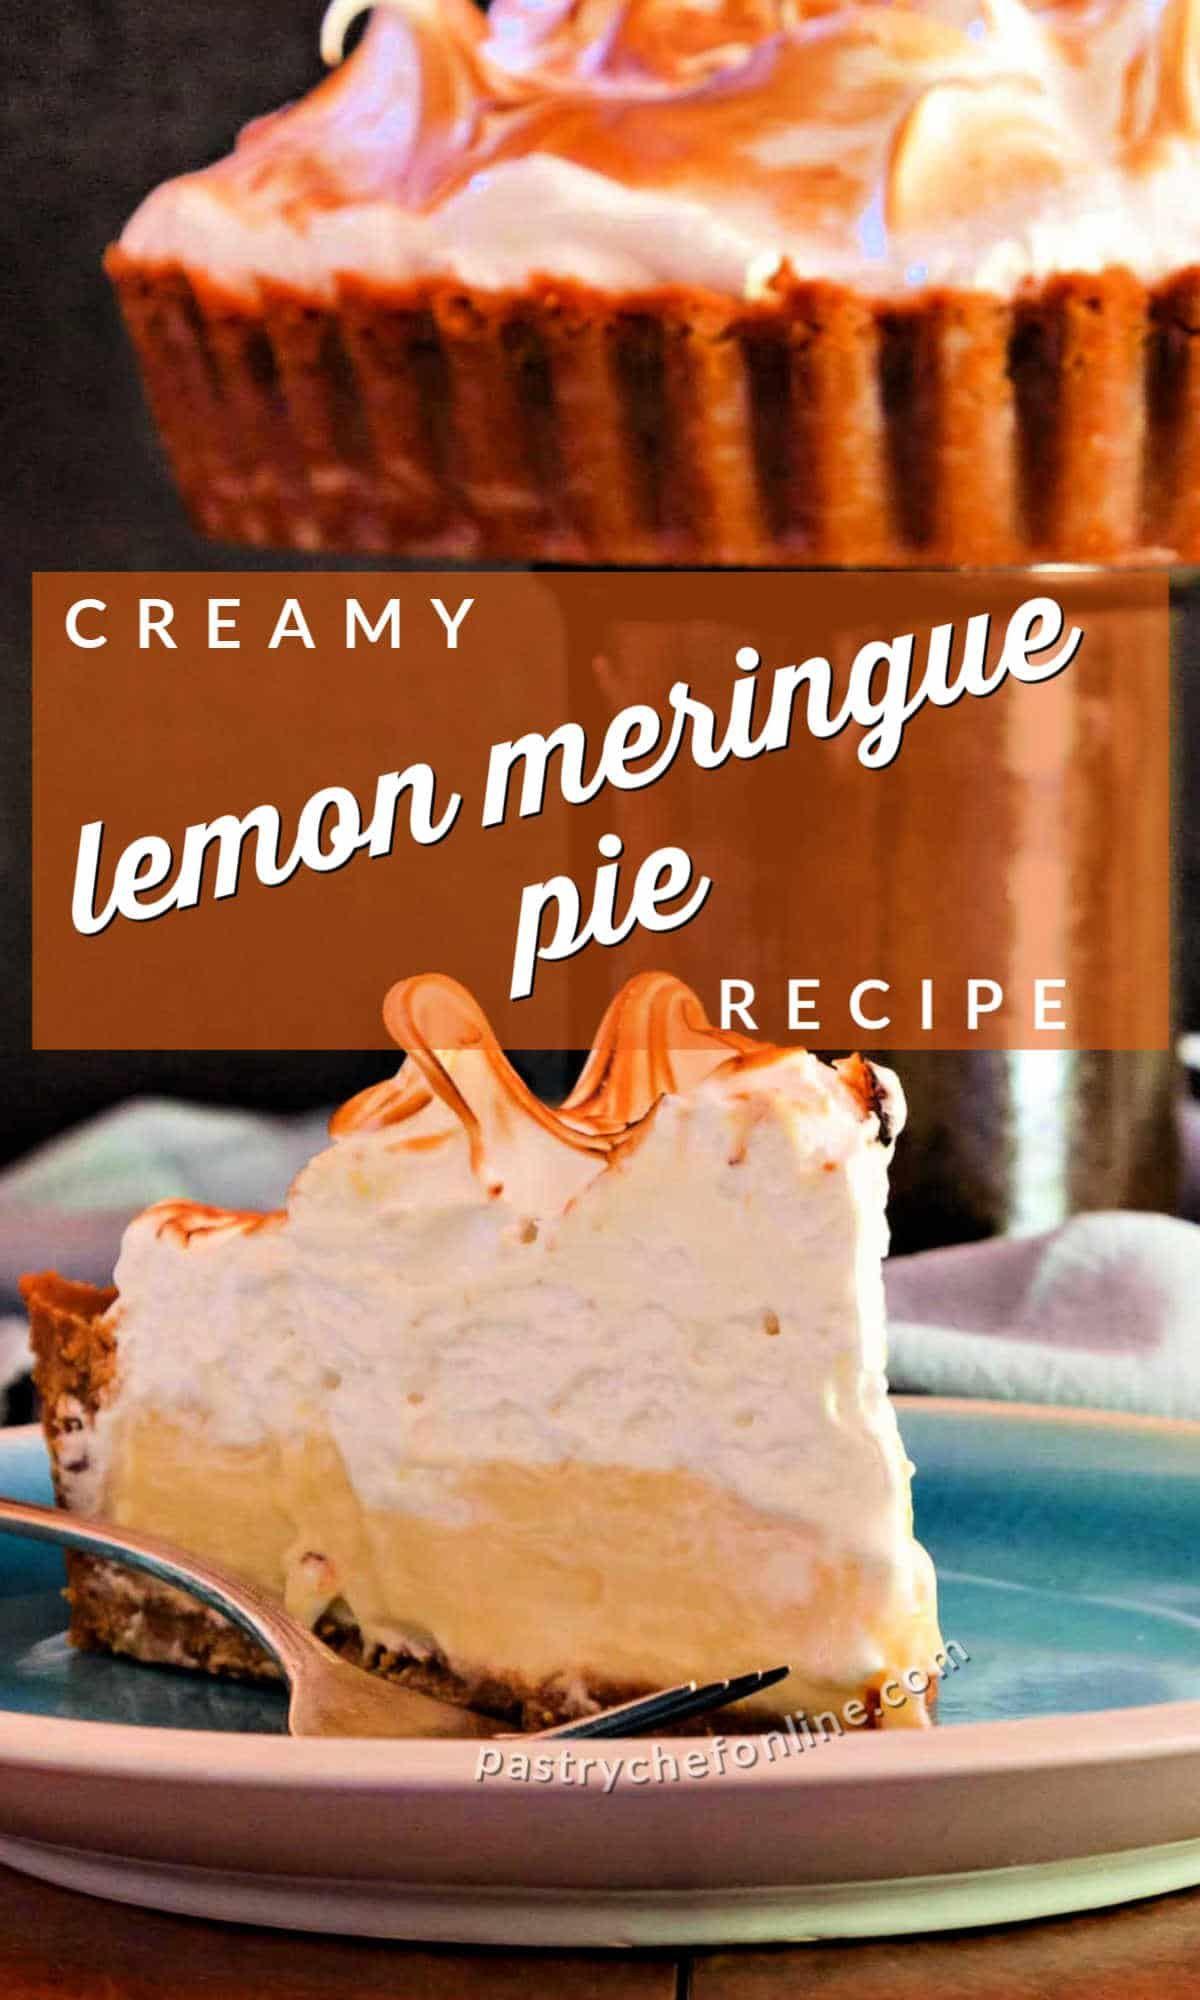 Deep Dish Lemon Meringue Tart Key Lemon Tart Pastry Chef Online In 2020 Meringue Pie Recipes Lemon Recipes Homemade Graham Cracker Crust